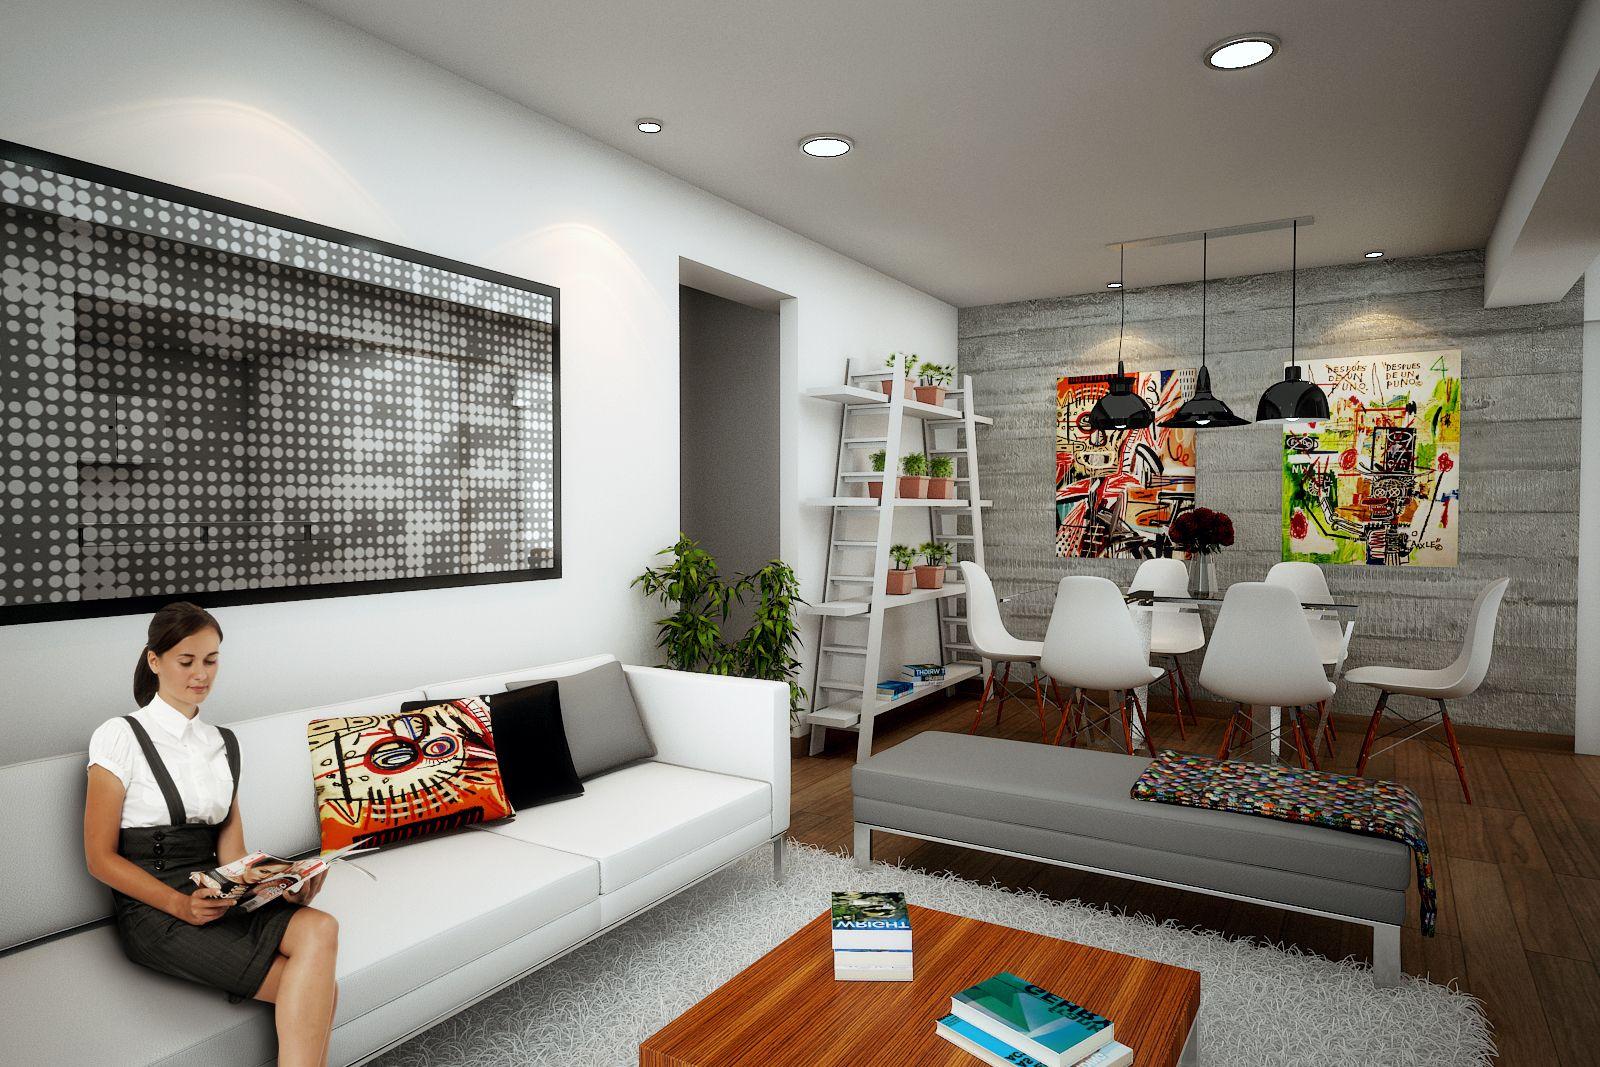 Dise o interior para la sala comedor del departamento for Departamento del interior